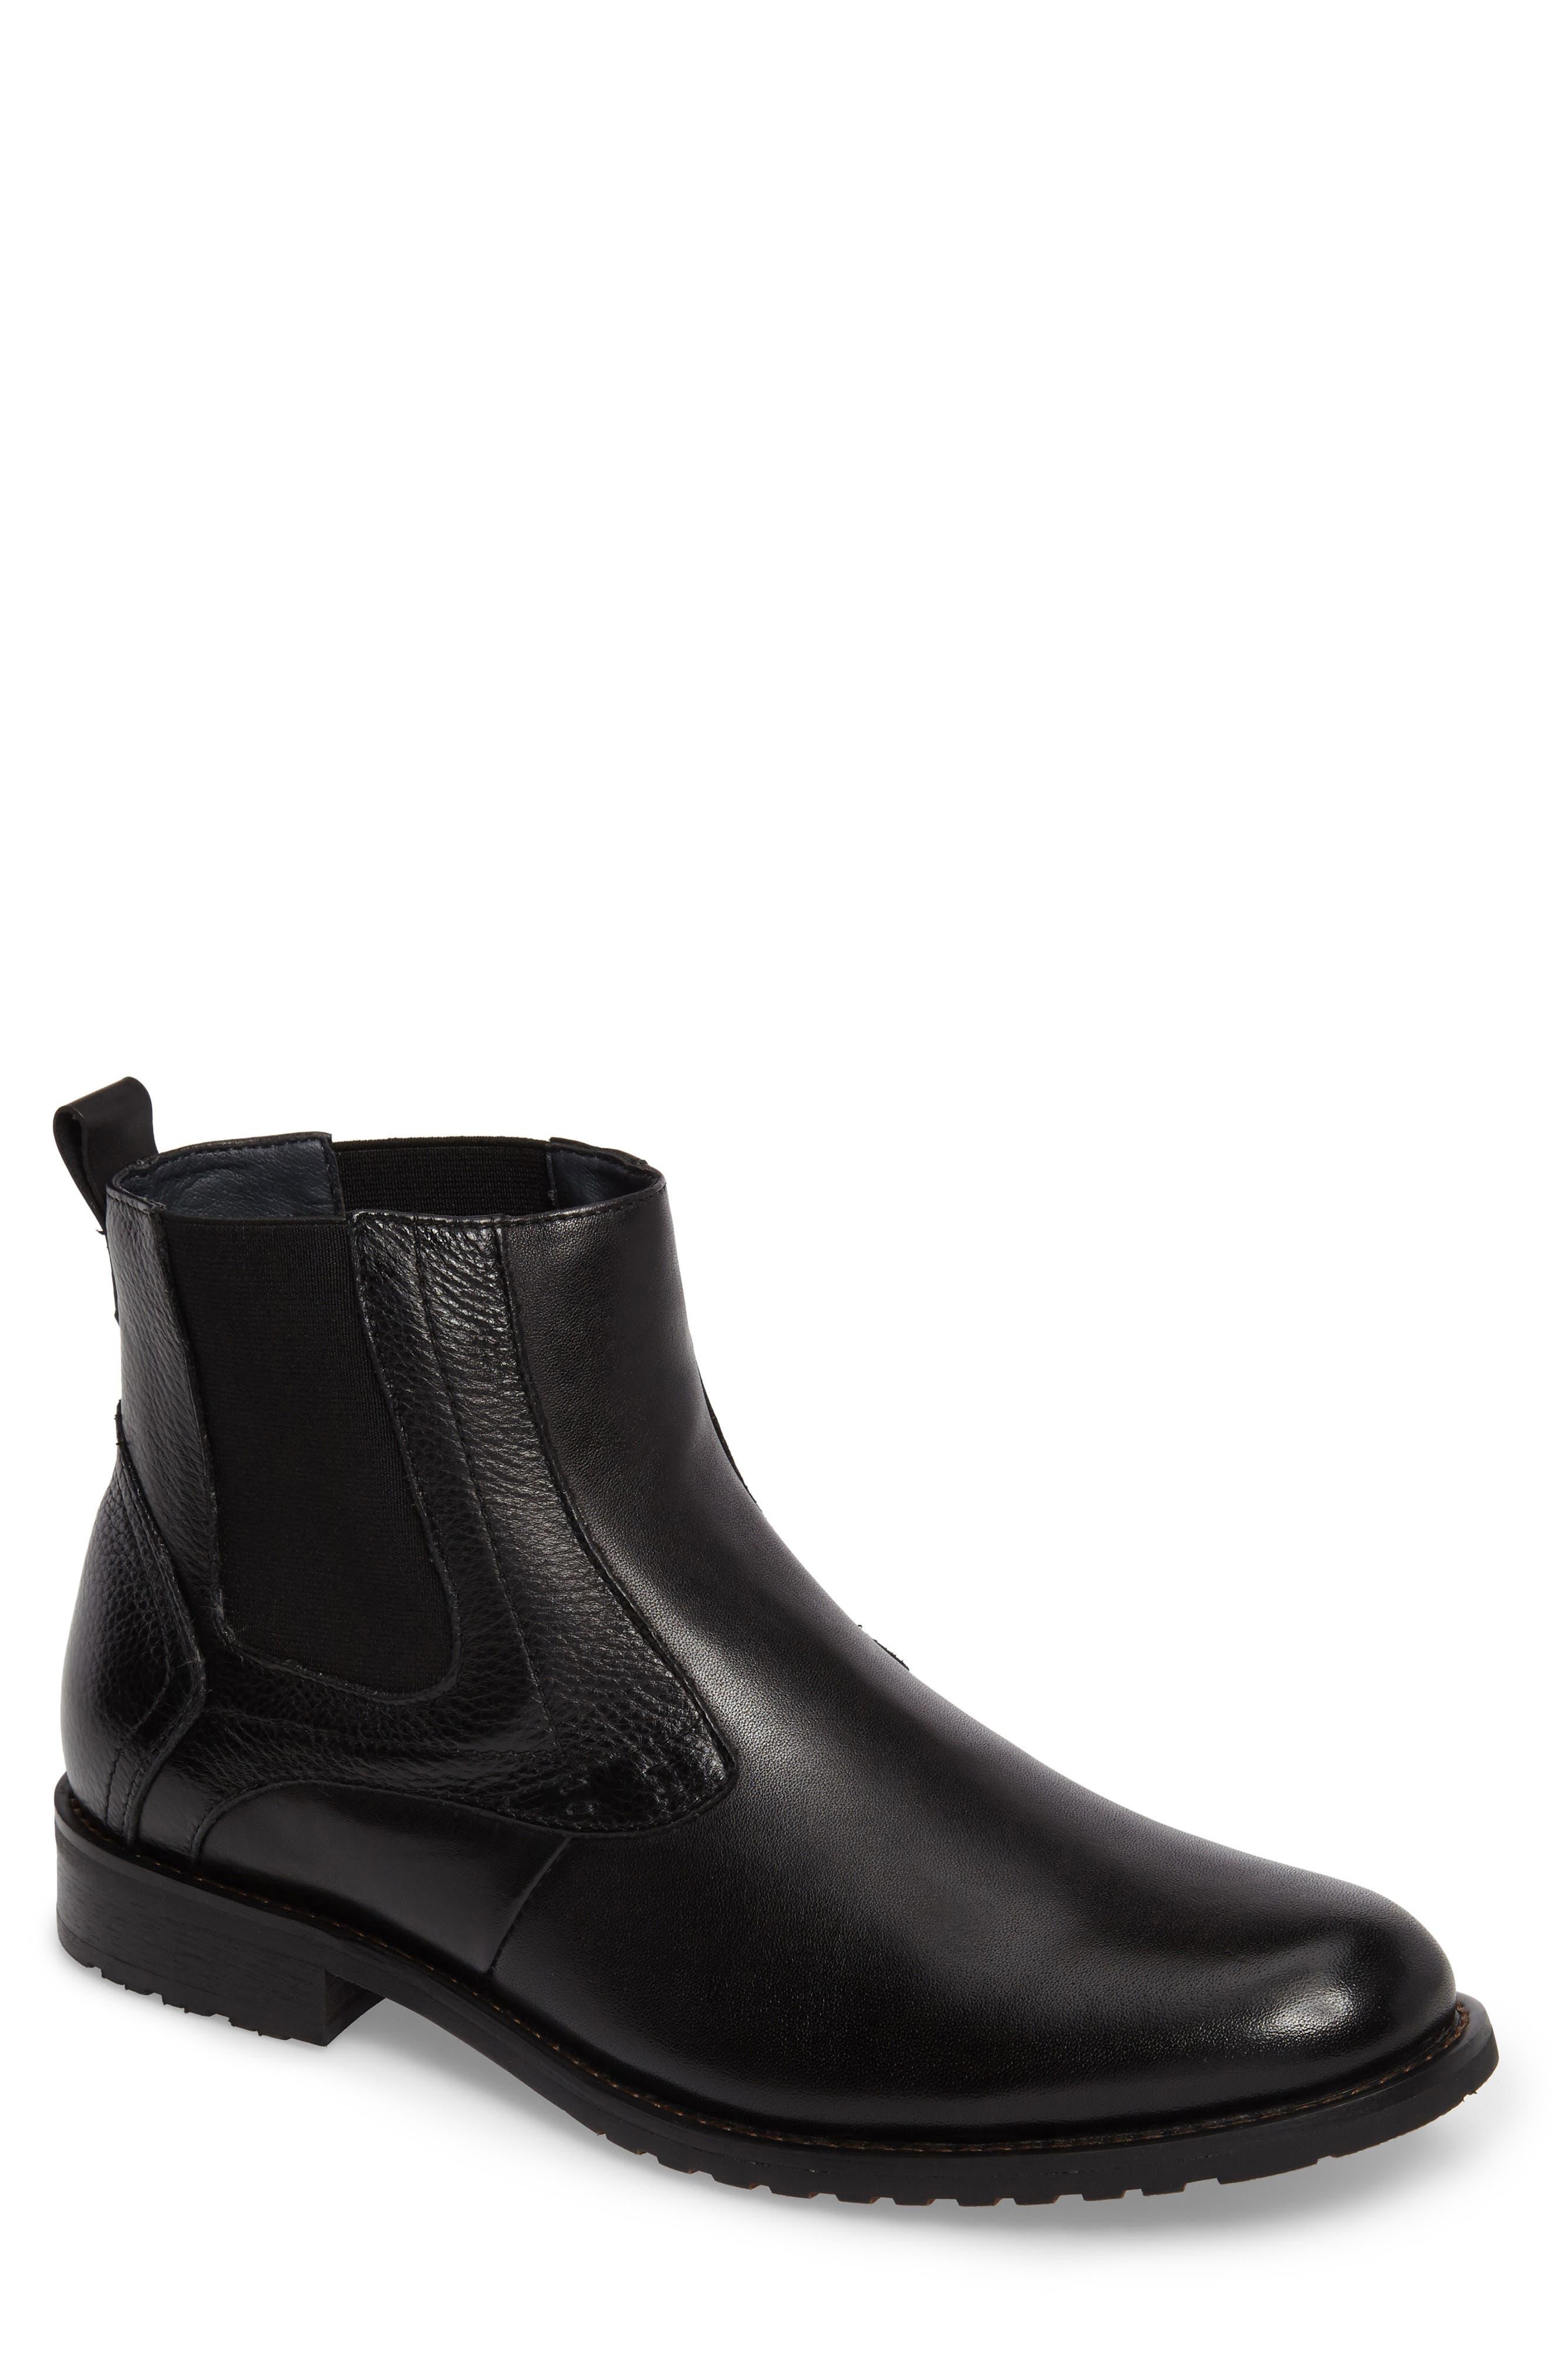 Oaks Chelsea Boot,                         Main,                         color, Black Leather